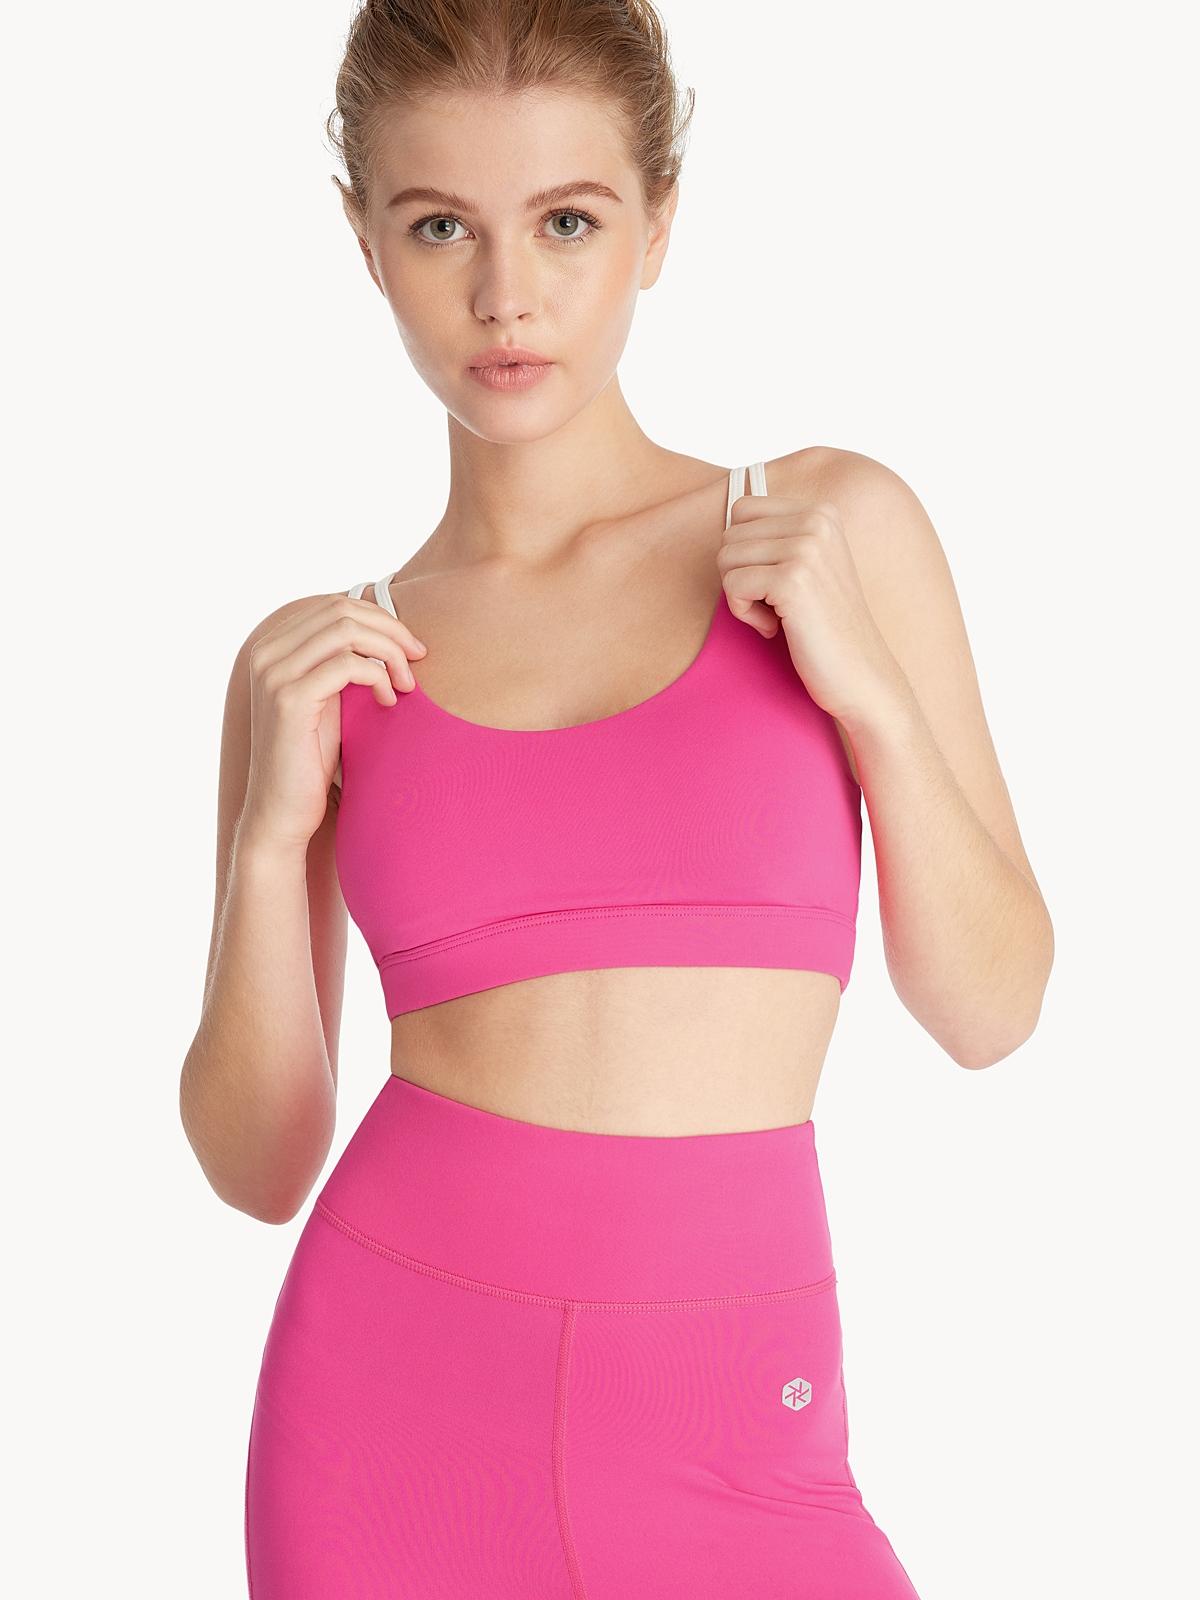 Double Strap Sports Bra Pink